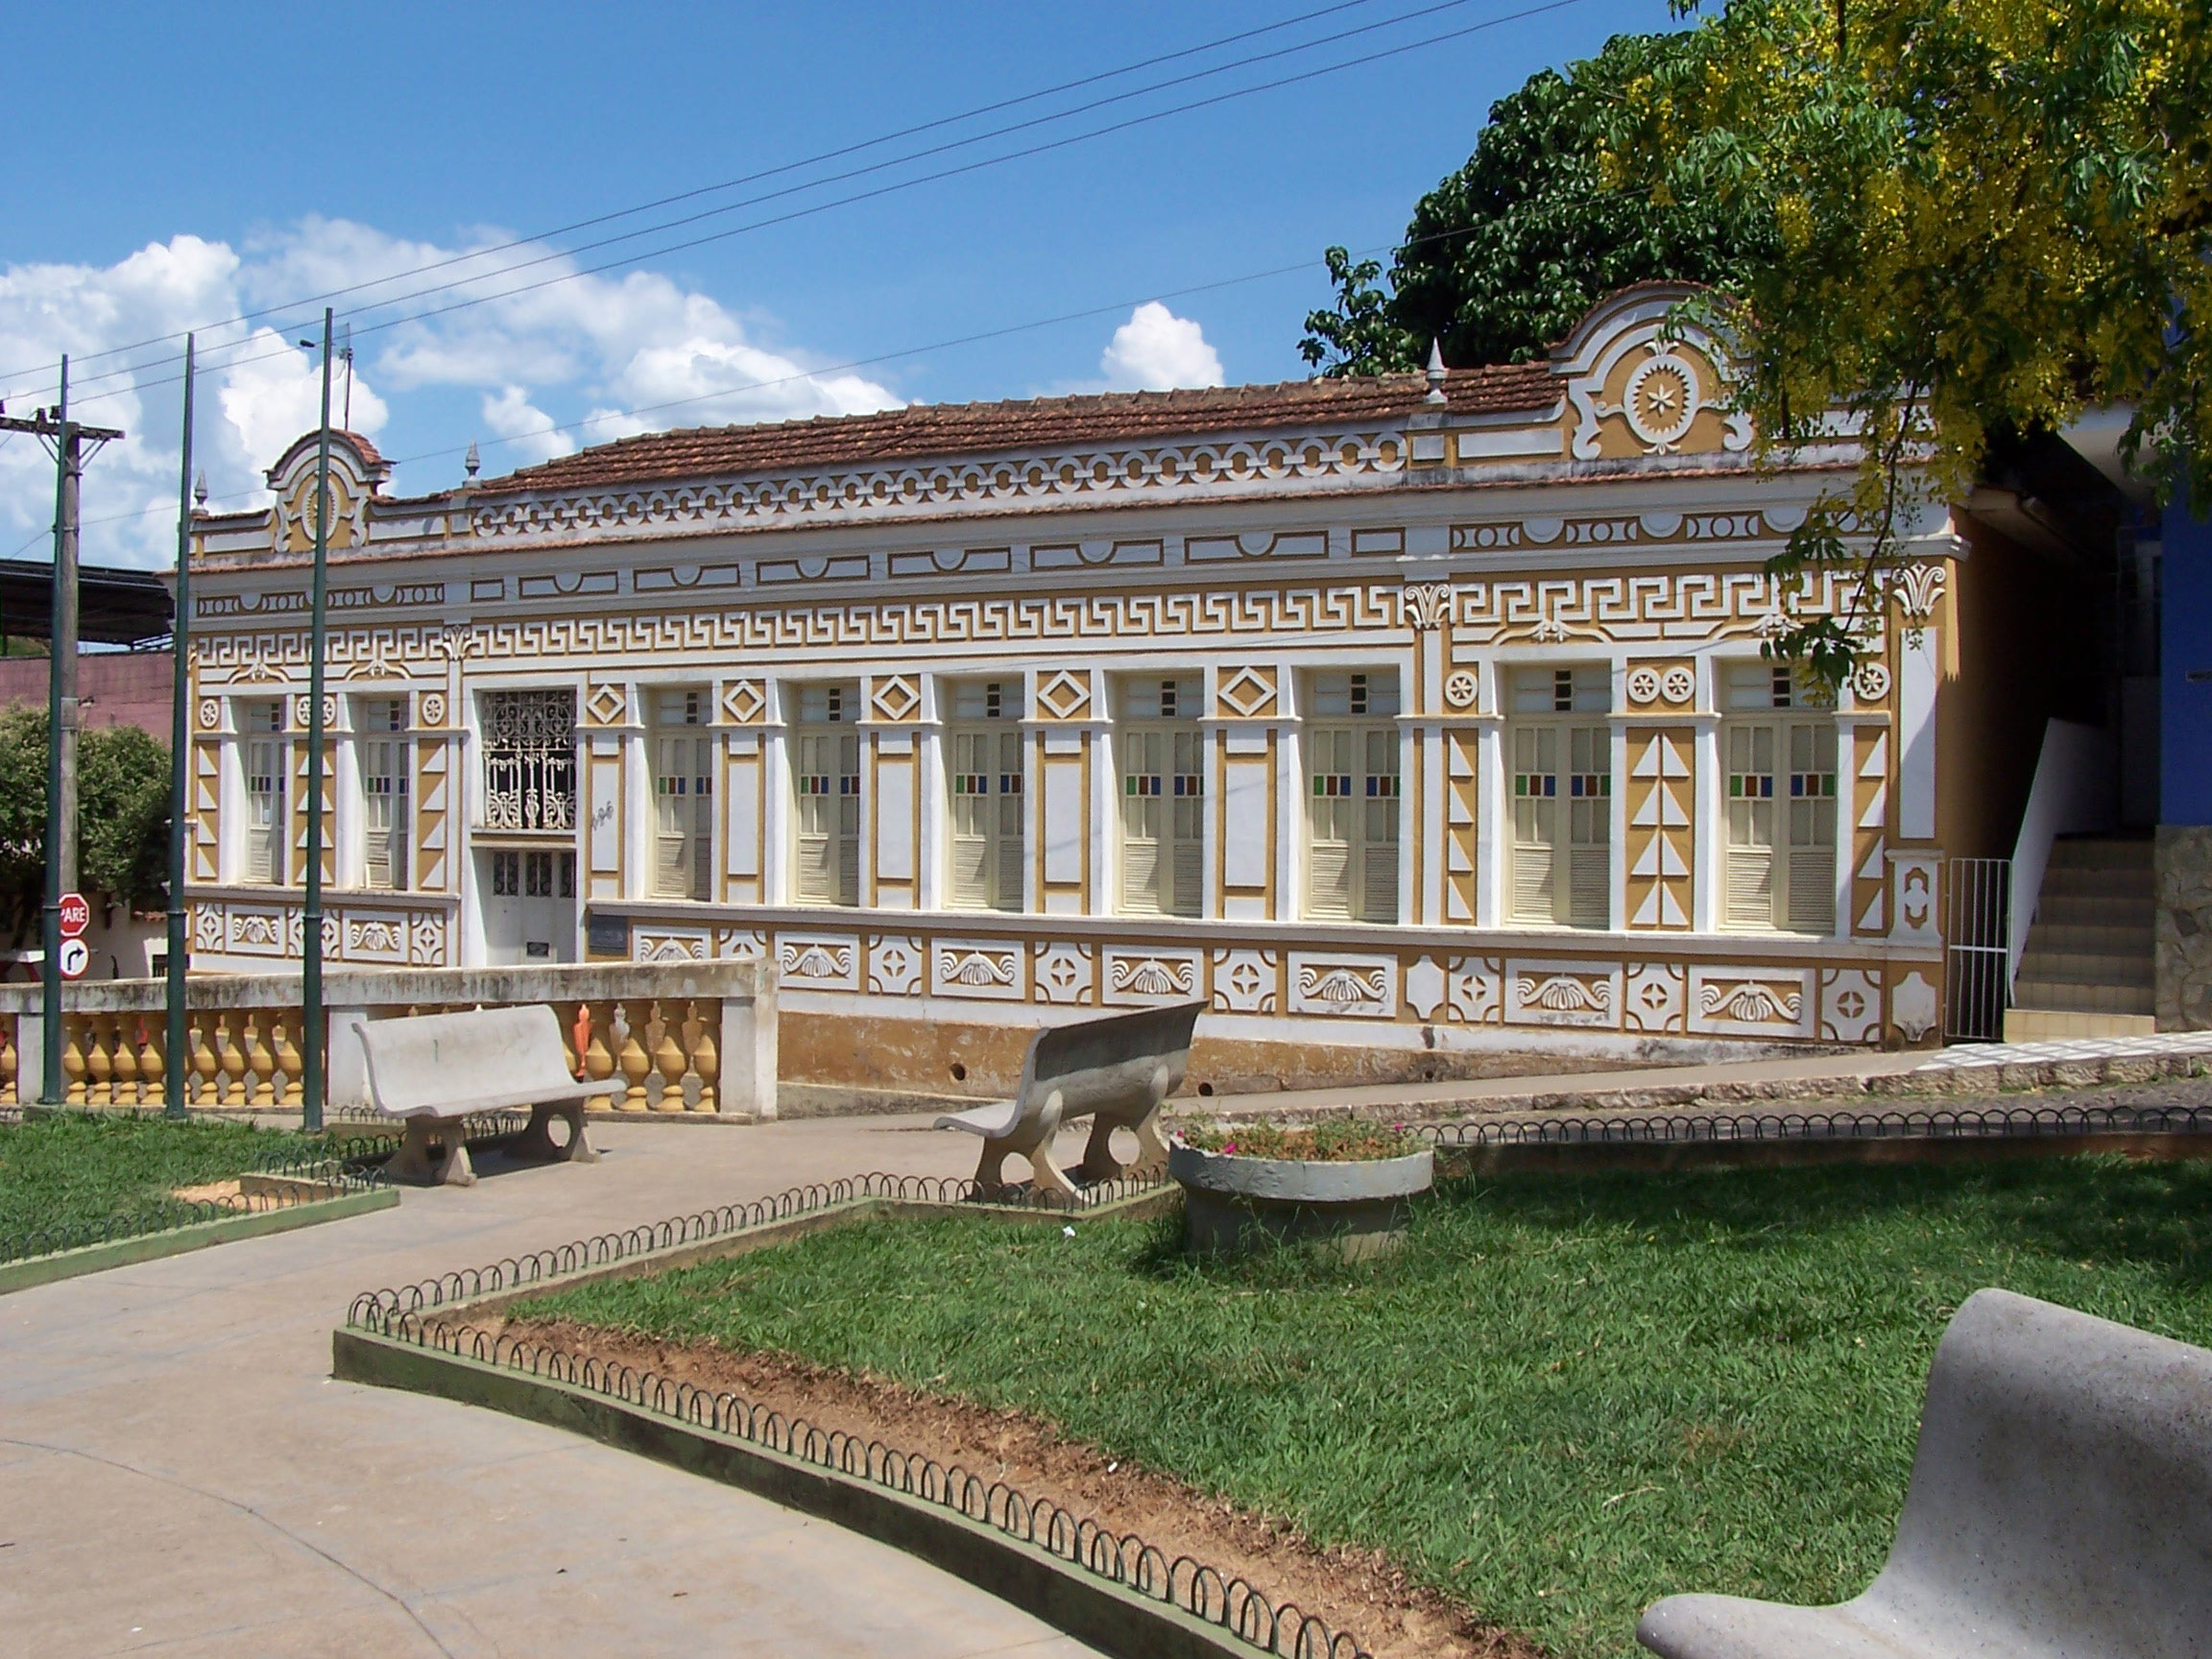 Miraí Minas Gerais fonte: upload.wikimedia.org